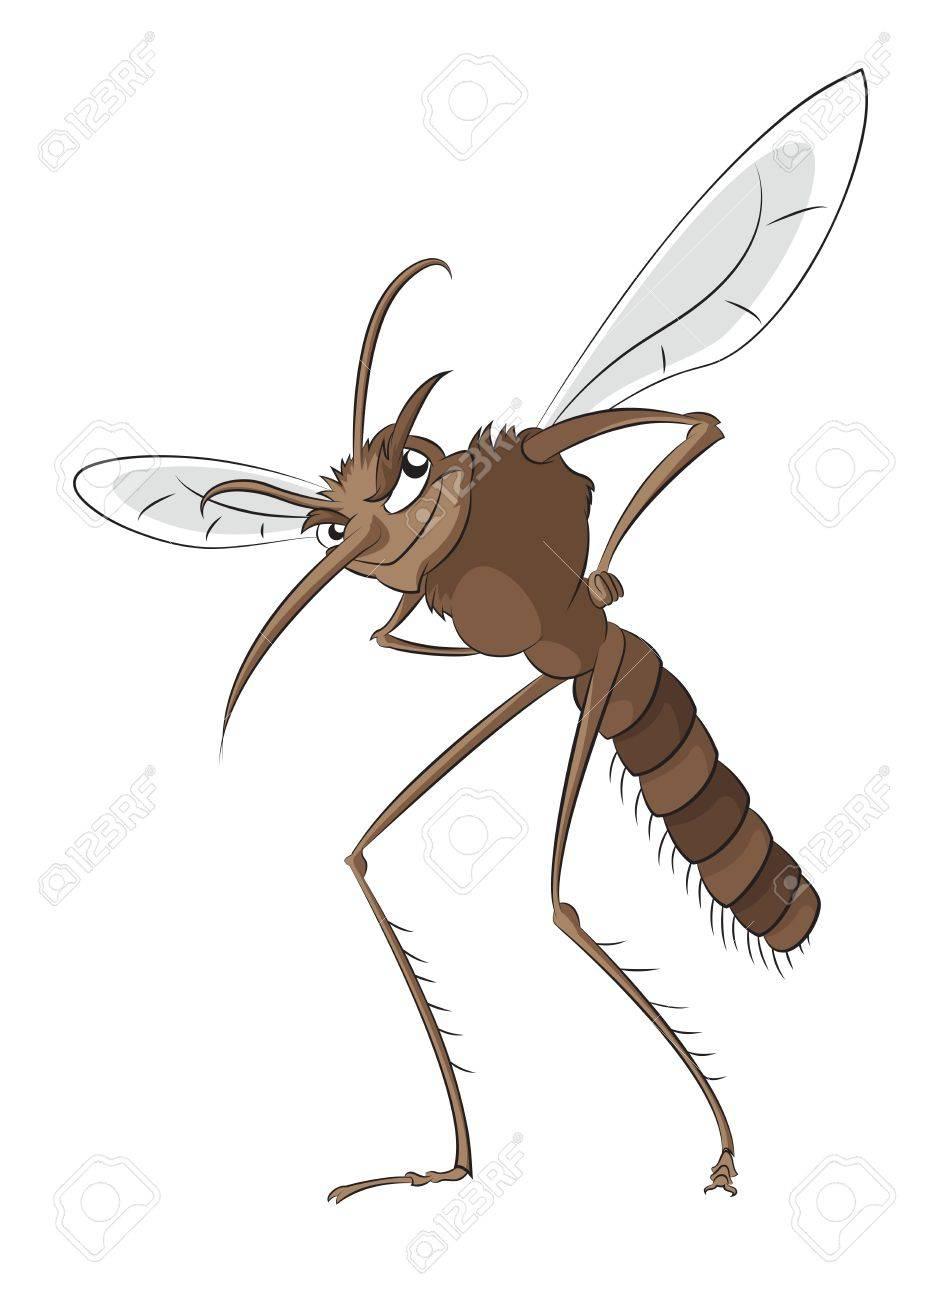 [Image: 21765486-image-of-big-evil-bad-mosquito.jpg]